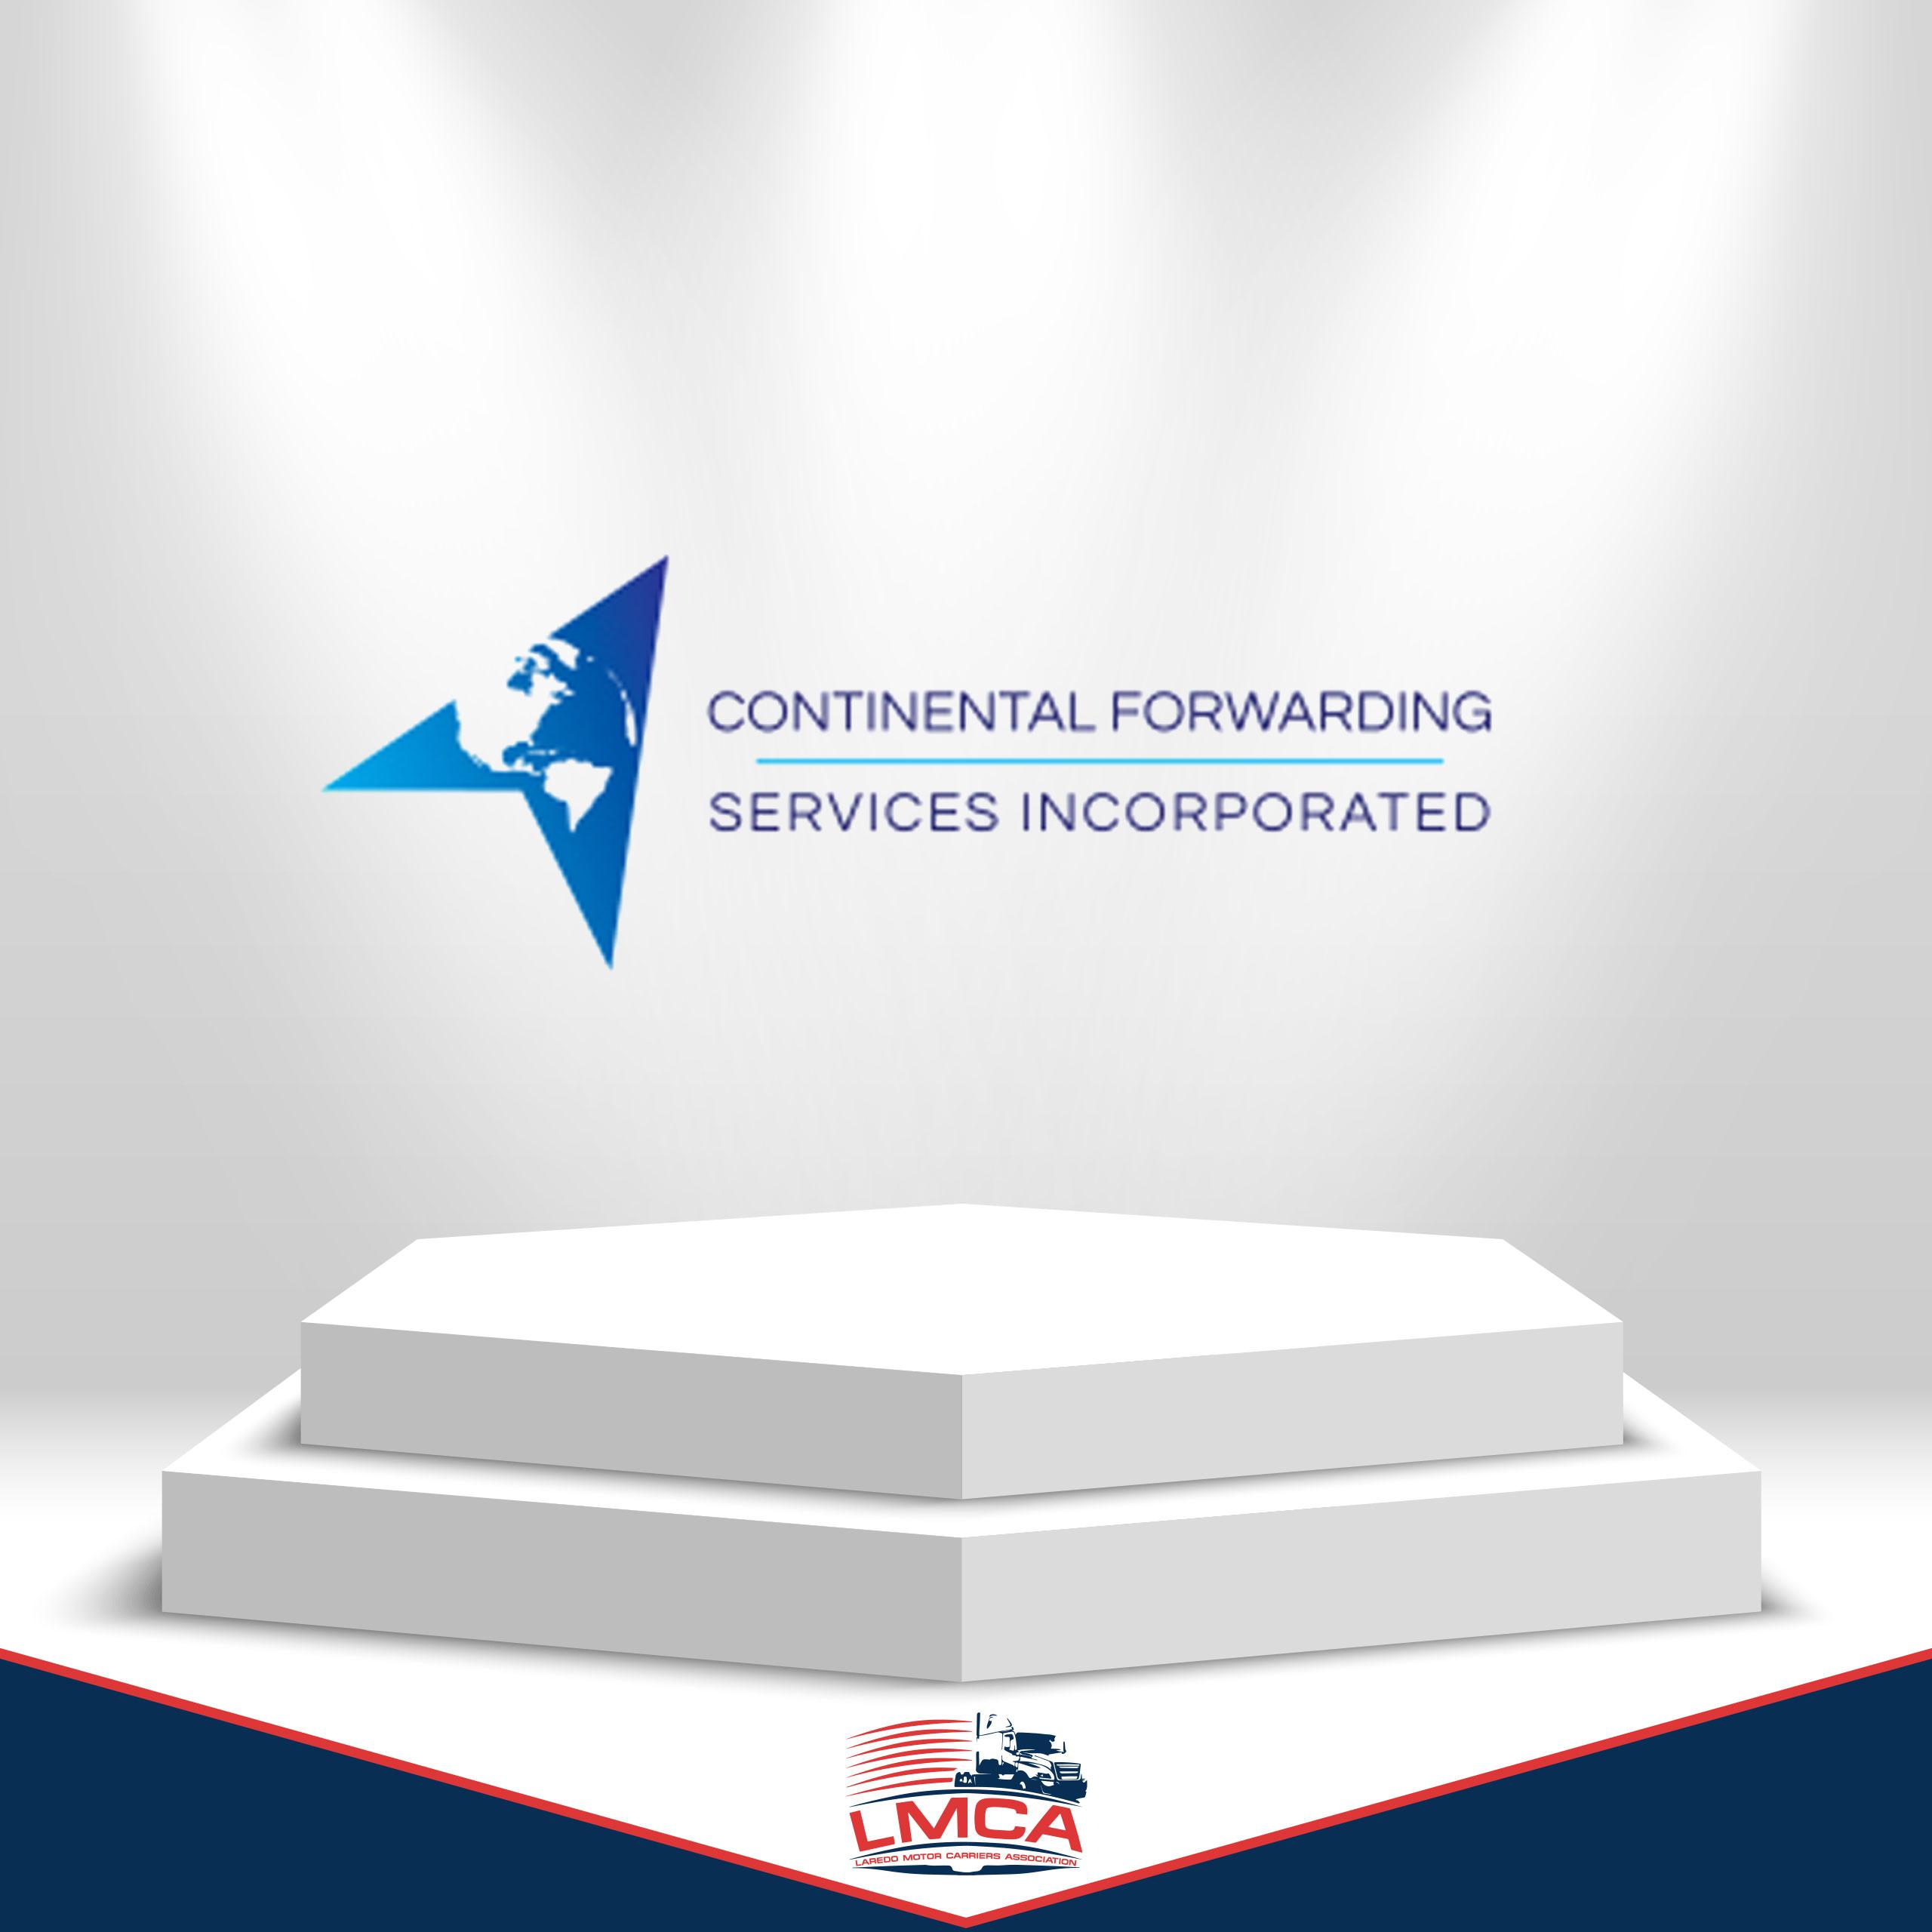 continental forwarding